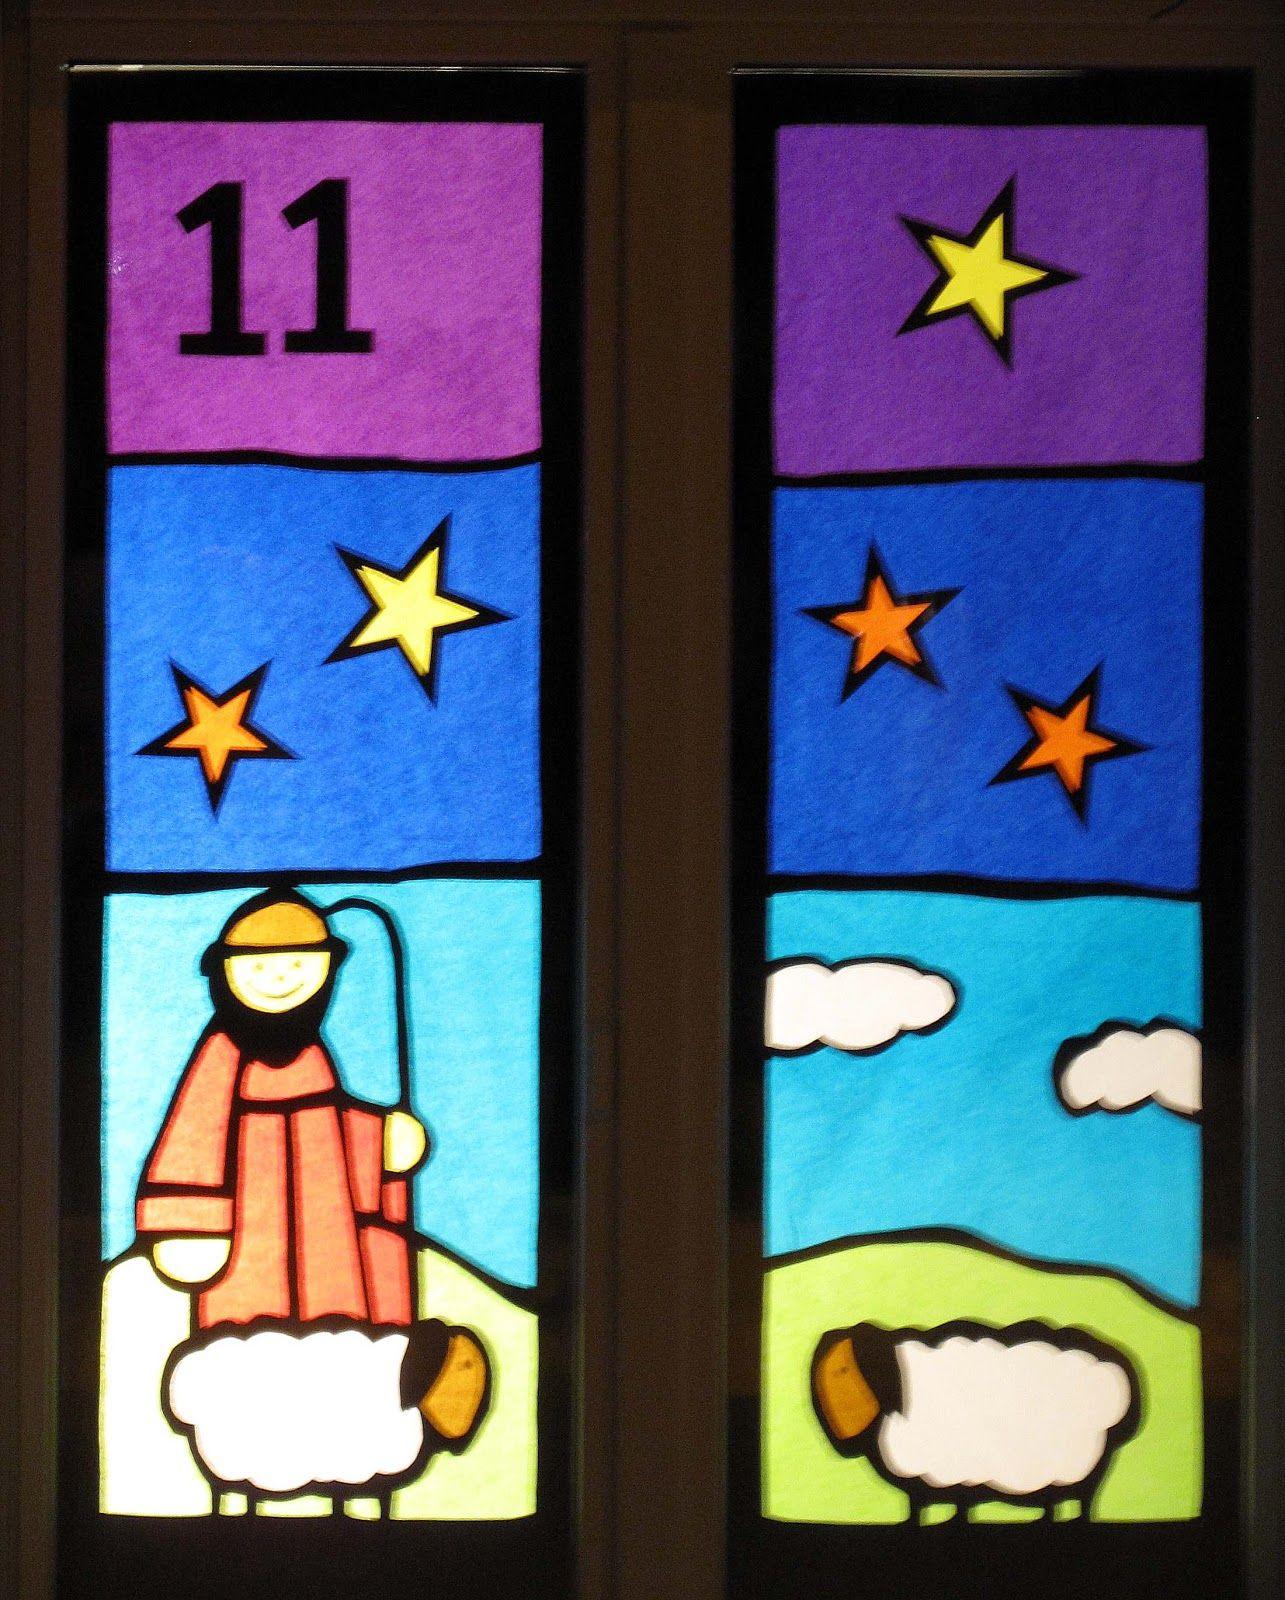 maladudesign adventsfenster am 11 dezember